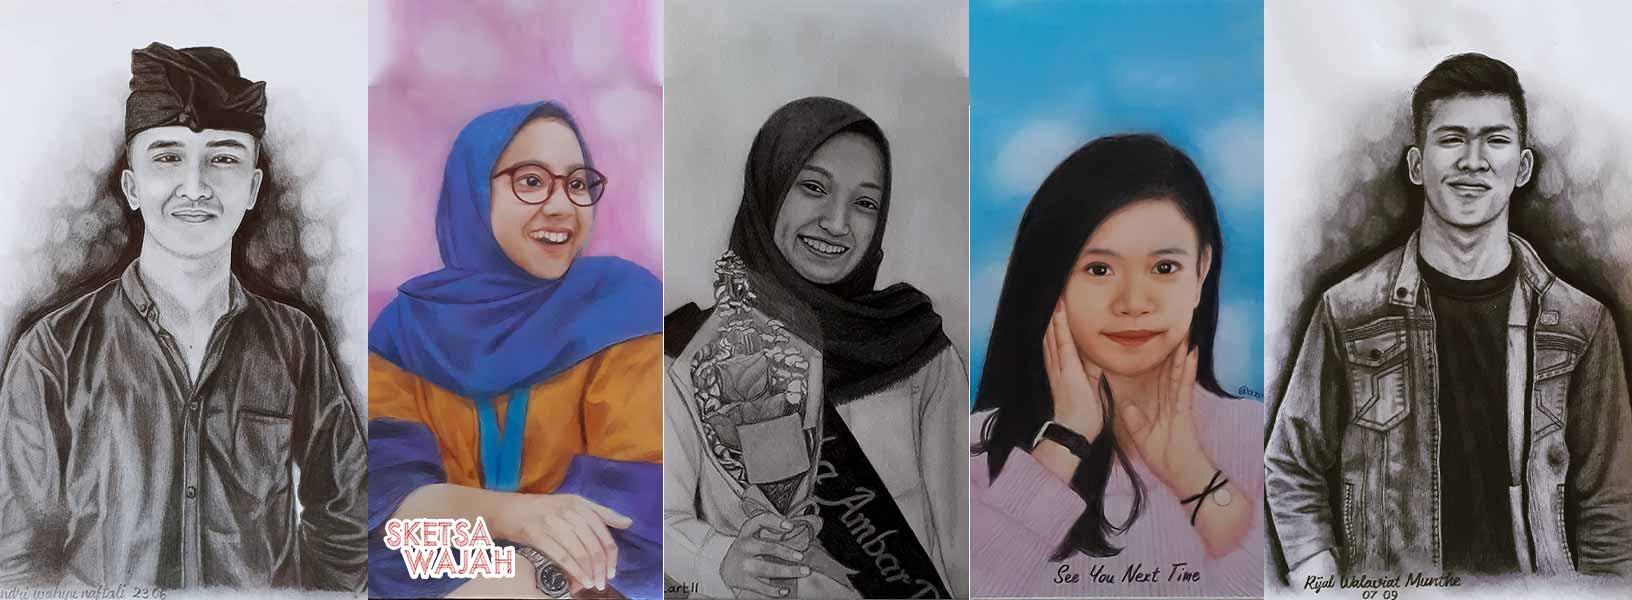 Karya Aza Art sketcher Sketsa Wajah